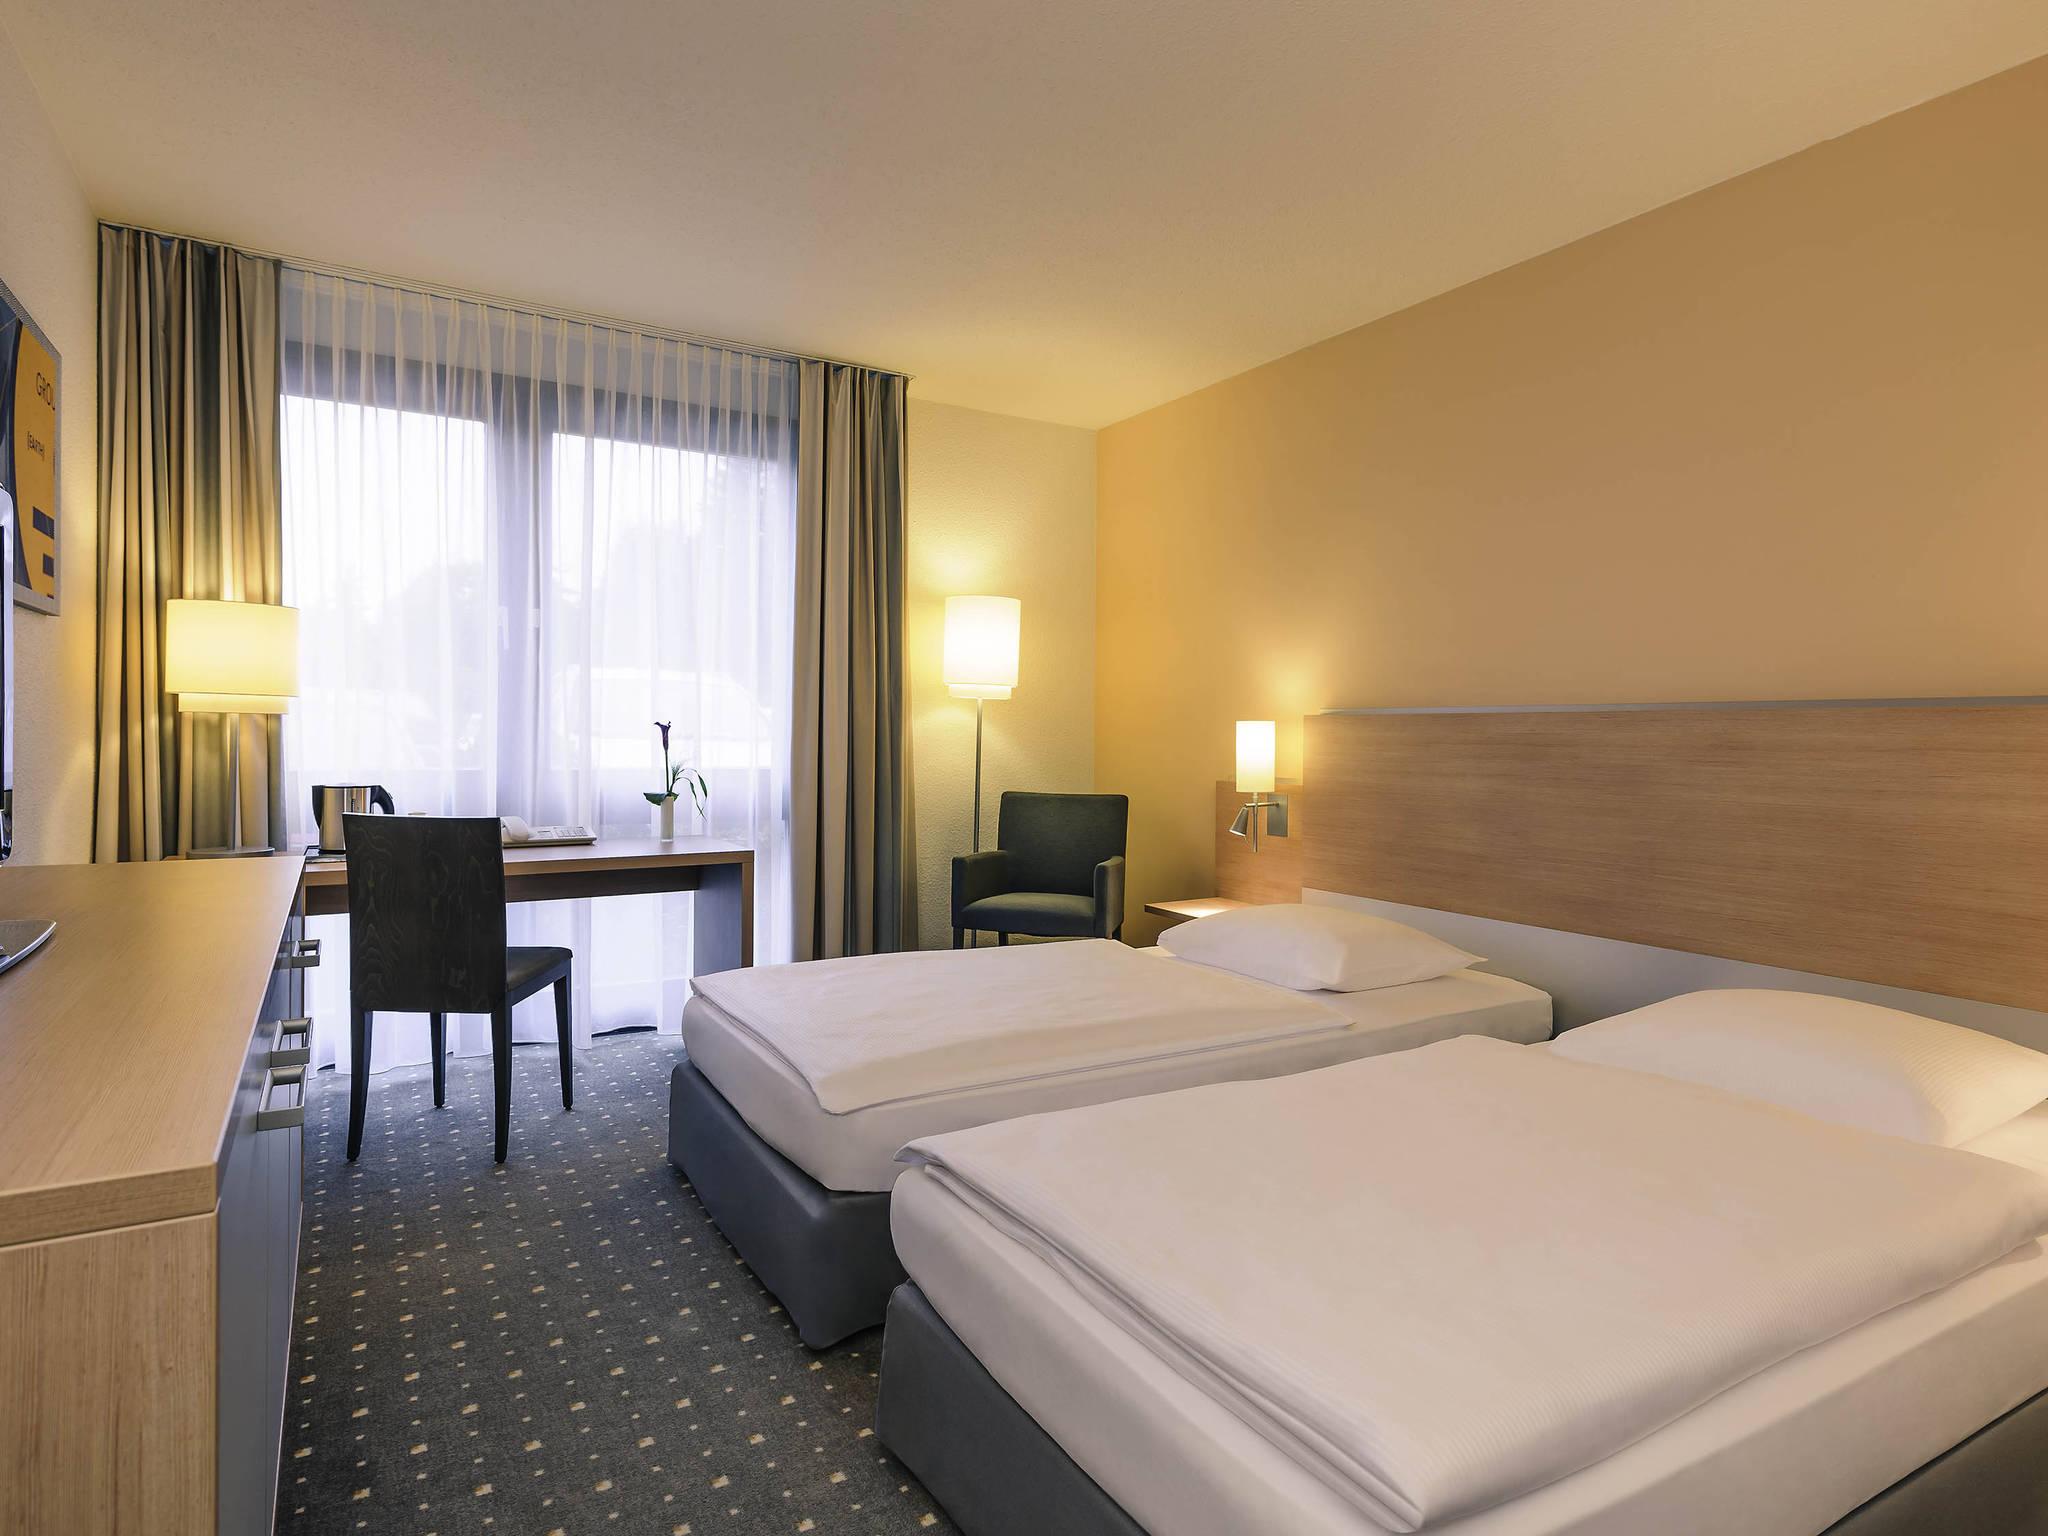 Mercure Hotel Frankfurt Airport. Book online now! Free Wifi!